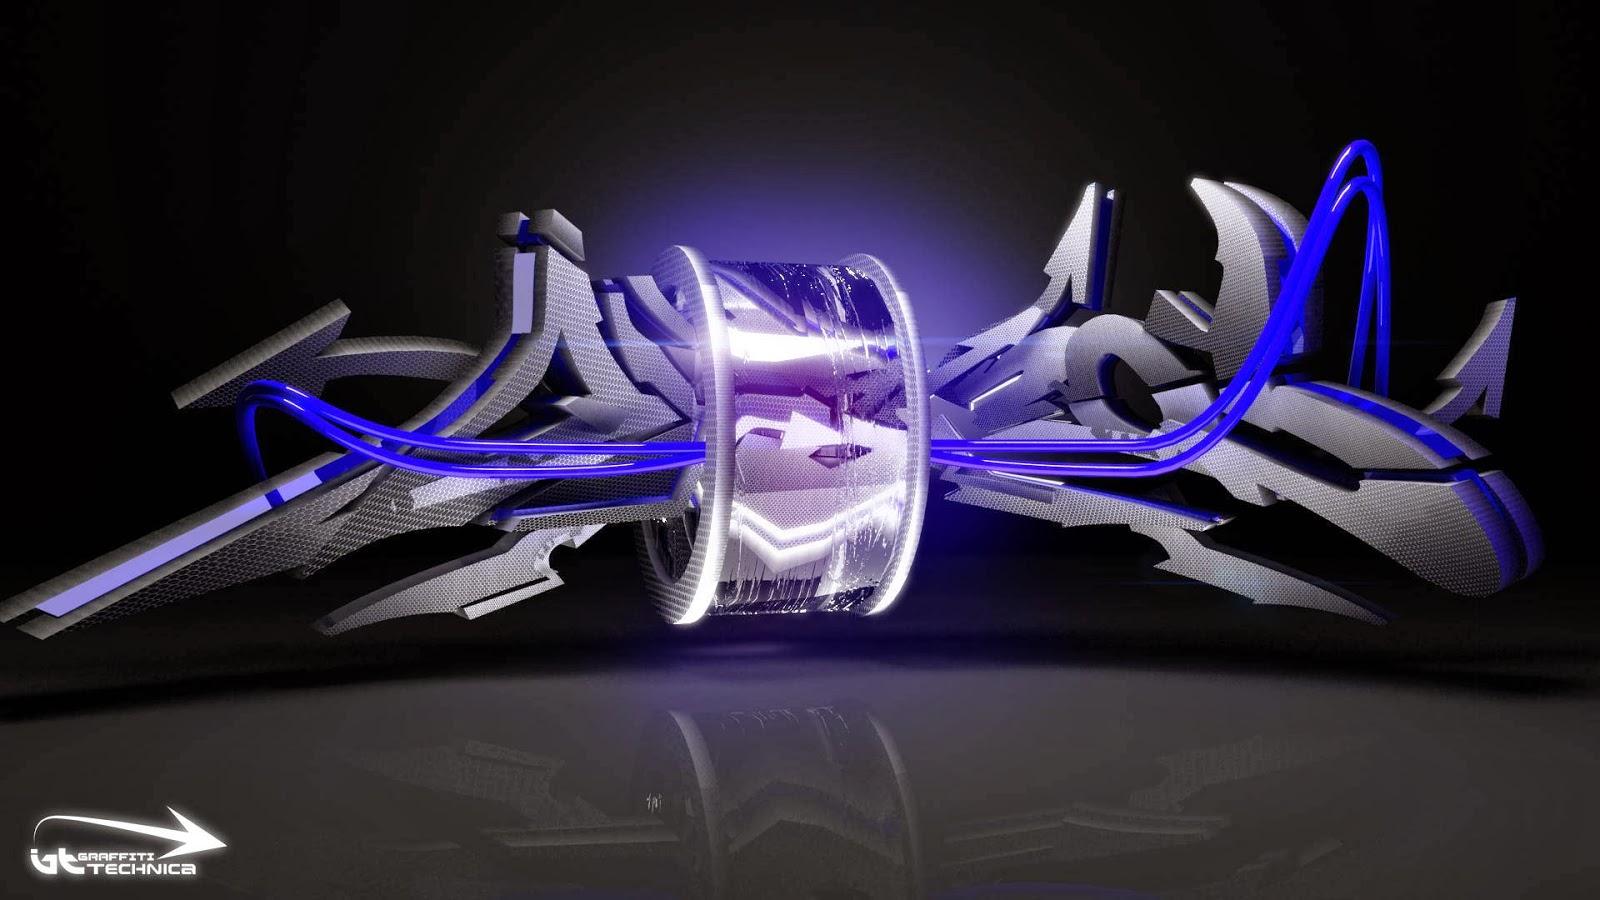 Fondo de pantalla abstracto graffiti en 3d imagenes for Immagini graffiti hd